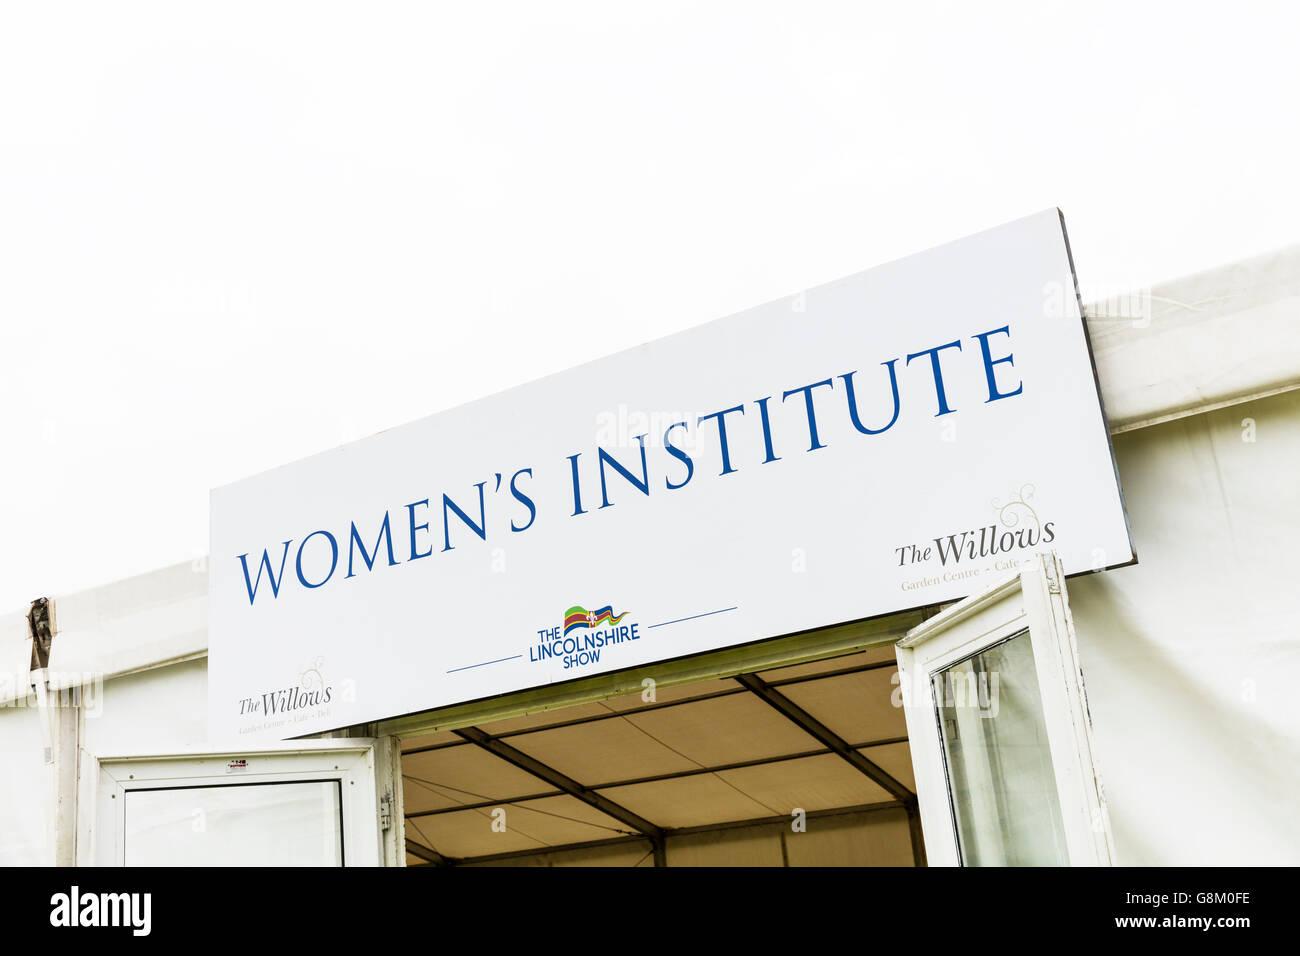 Women's institute WI sign womens organisation organization UK England GB community-based organisation for women - Stock Image